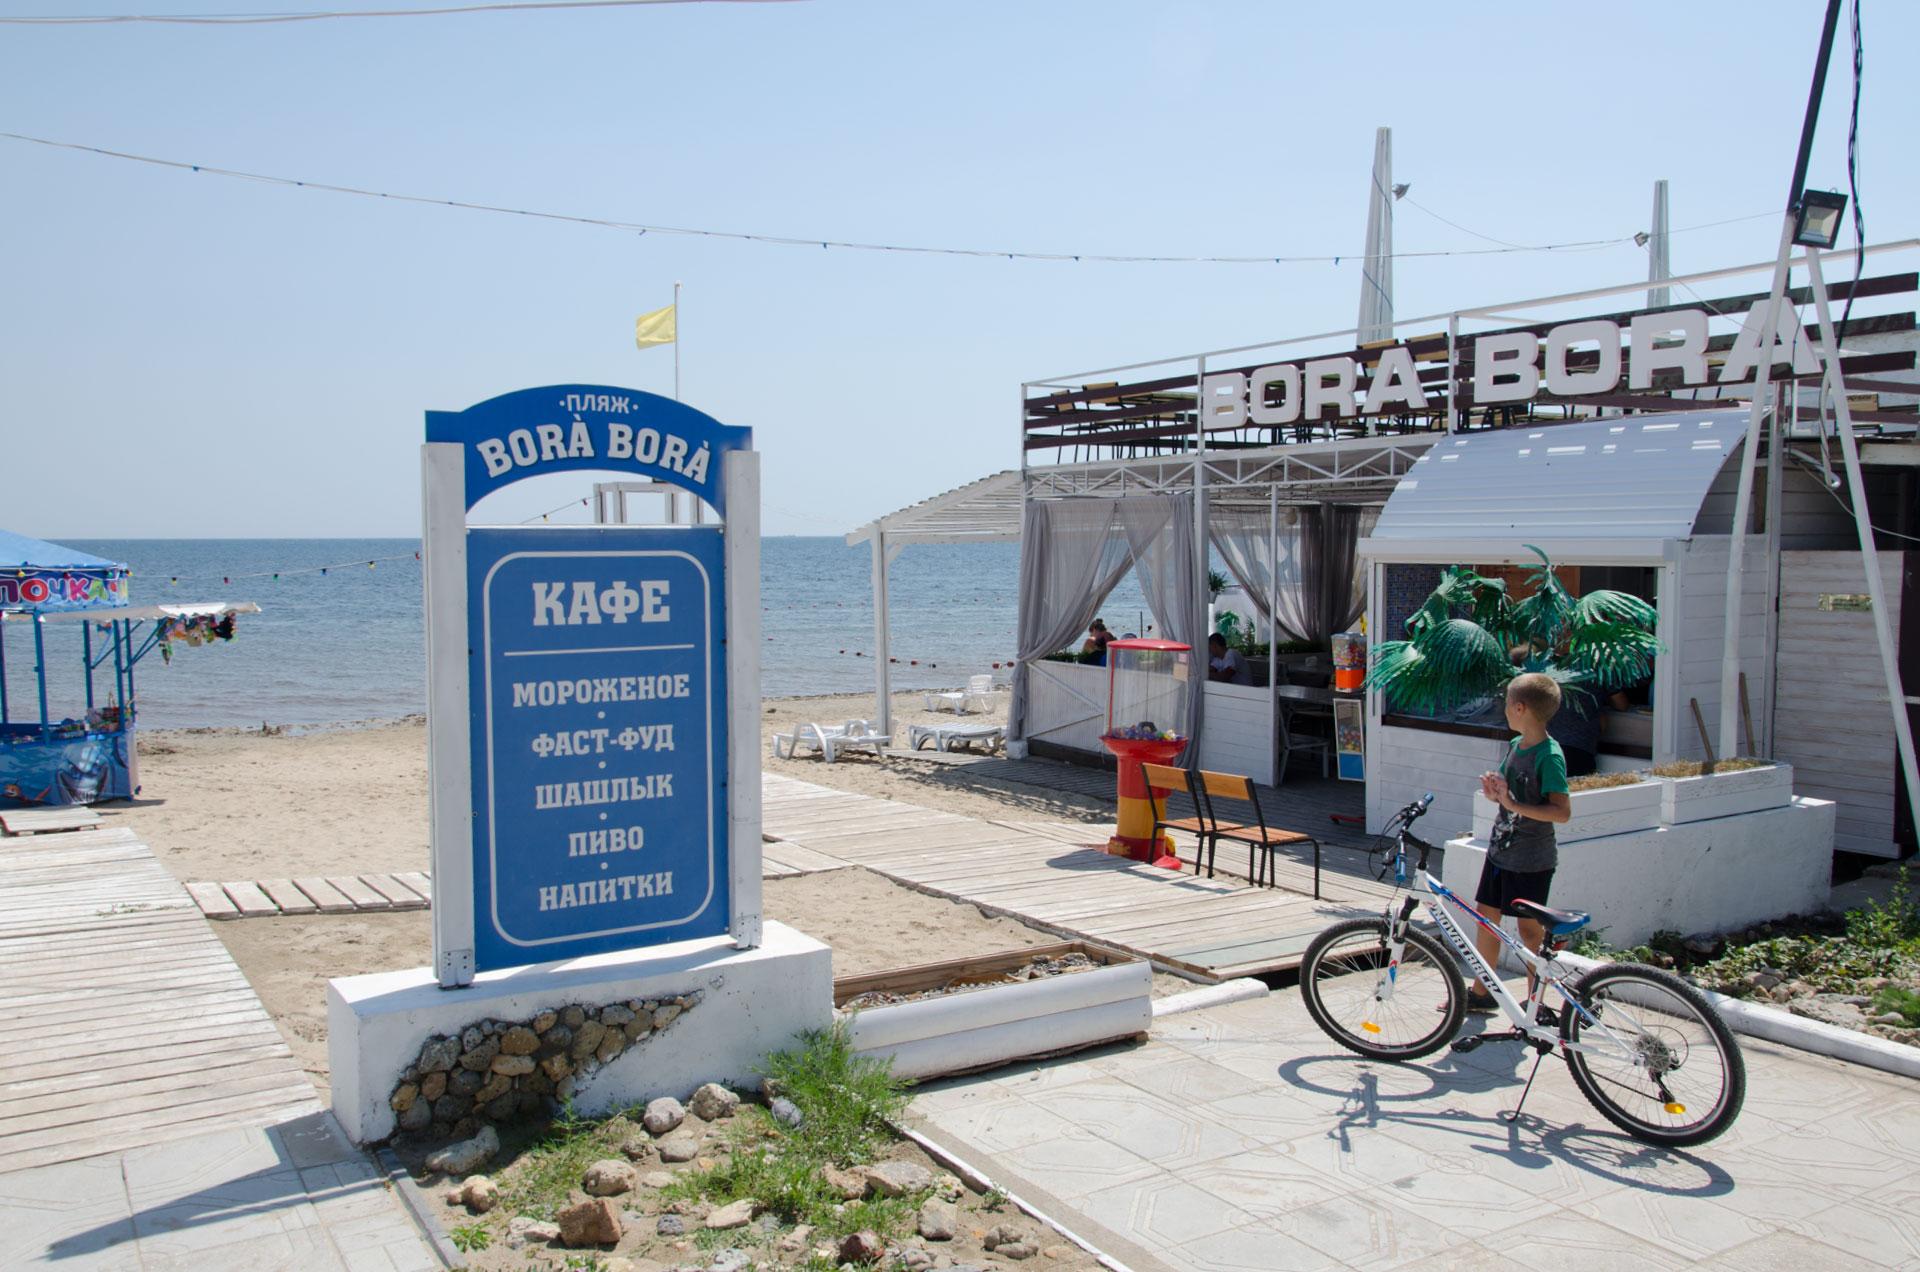 Пляж BORA BORA. Фото Заозёрного